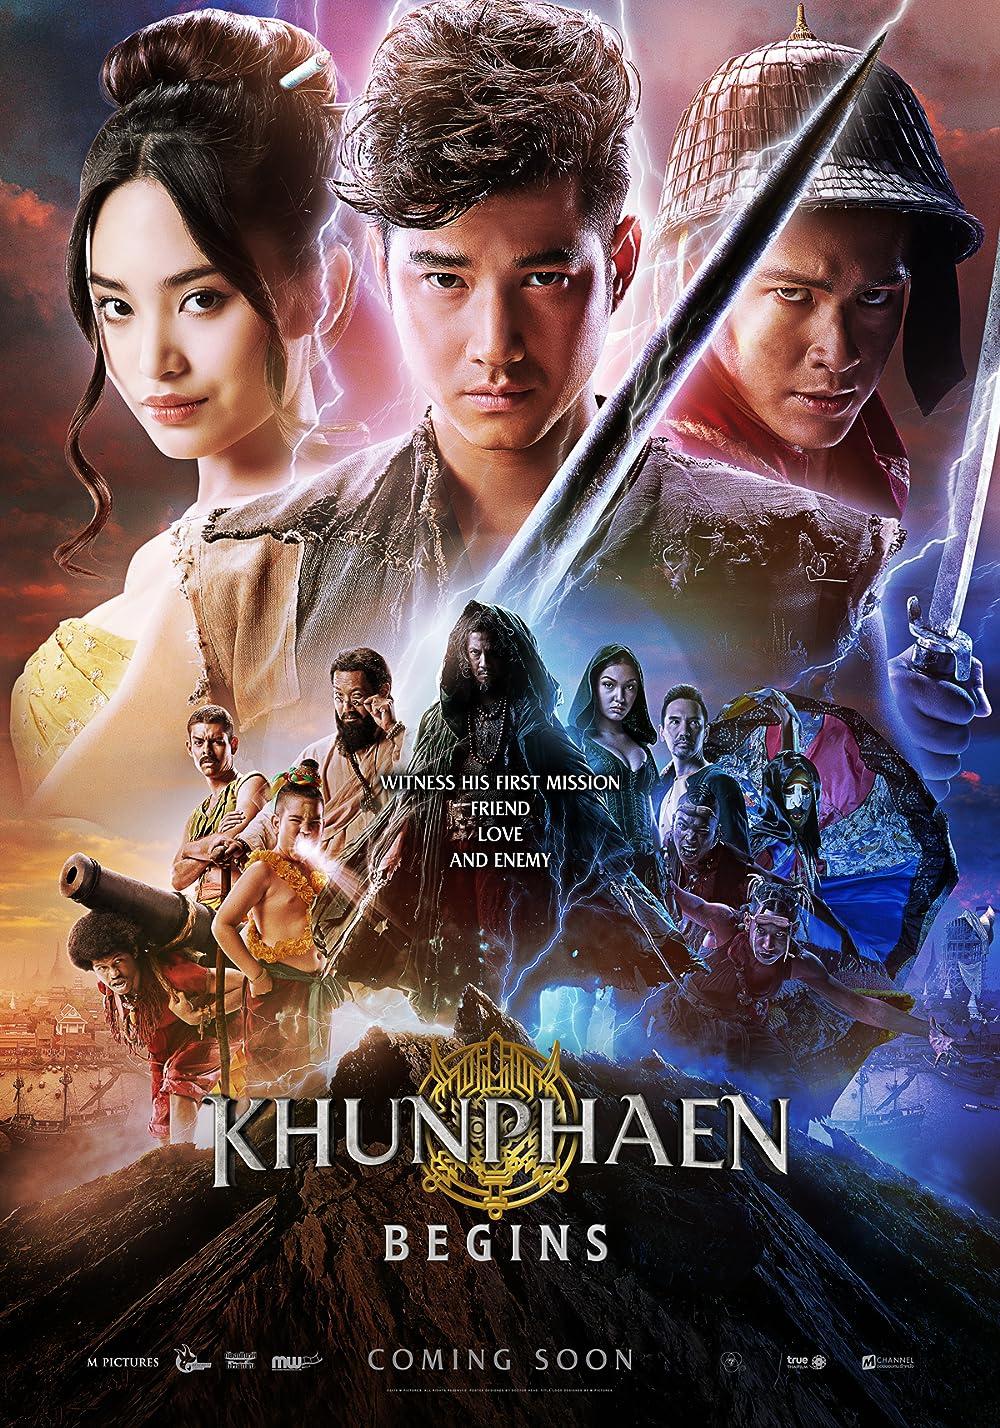 Khun Phaen Begins Screen Shot 1